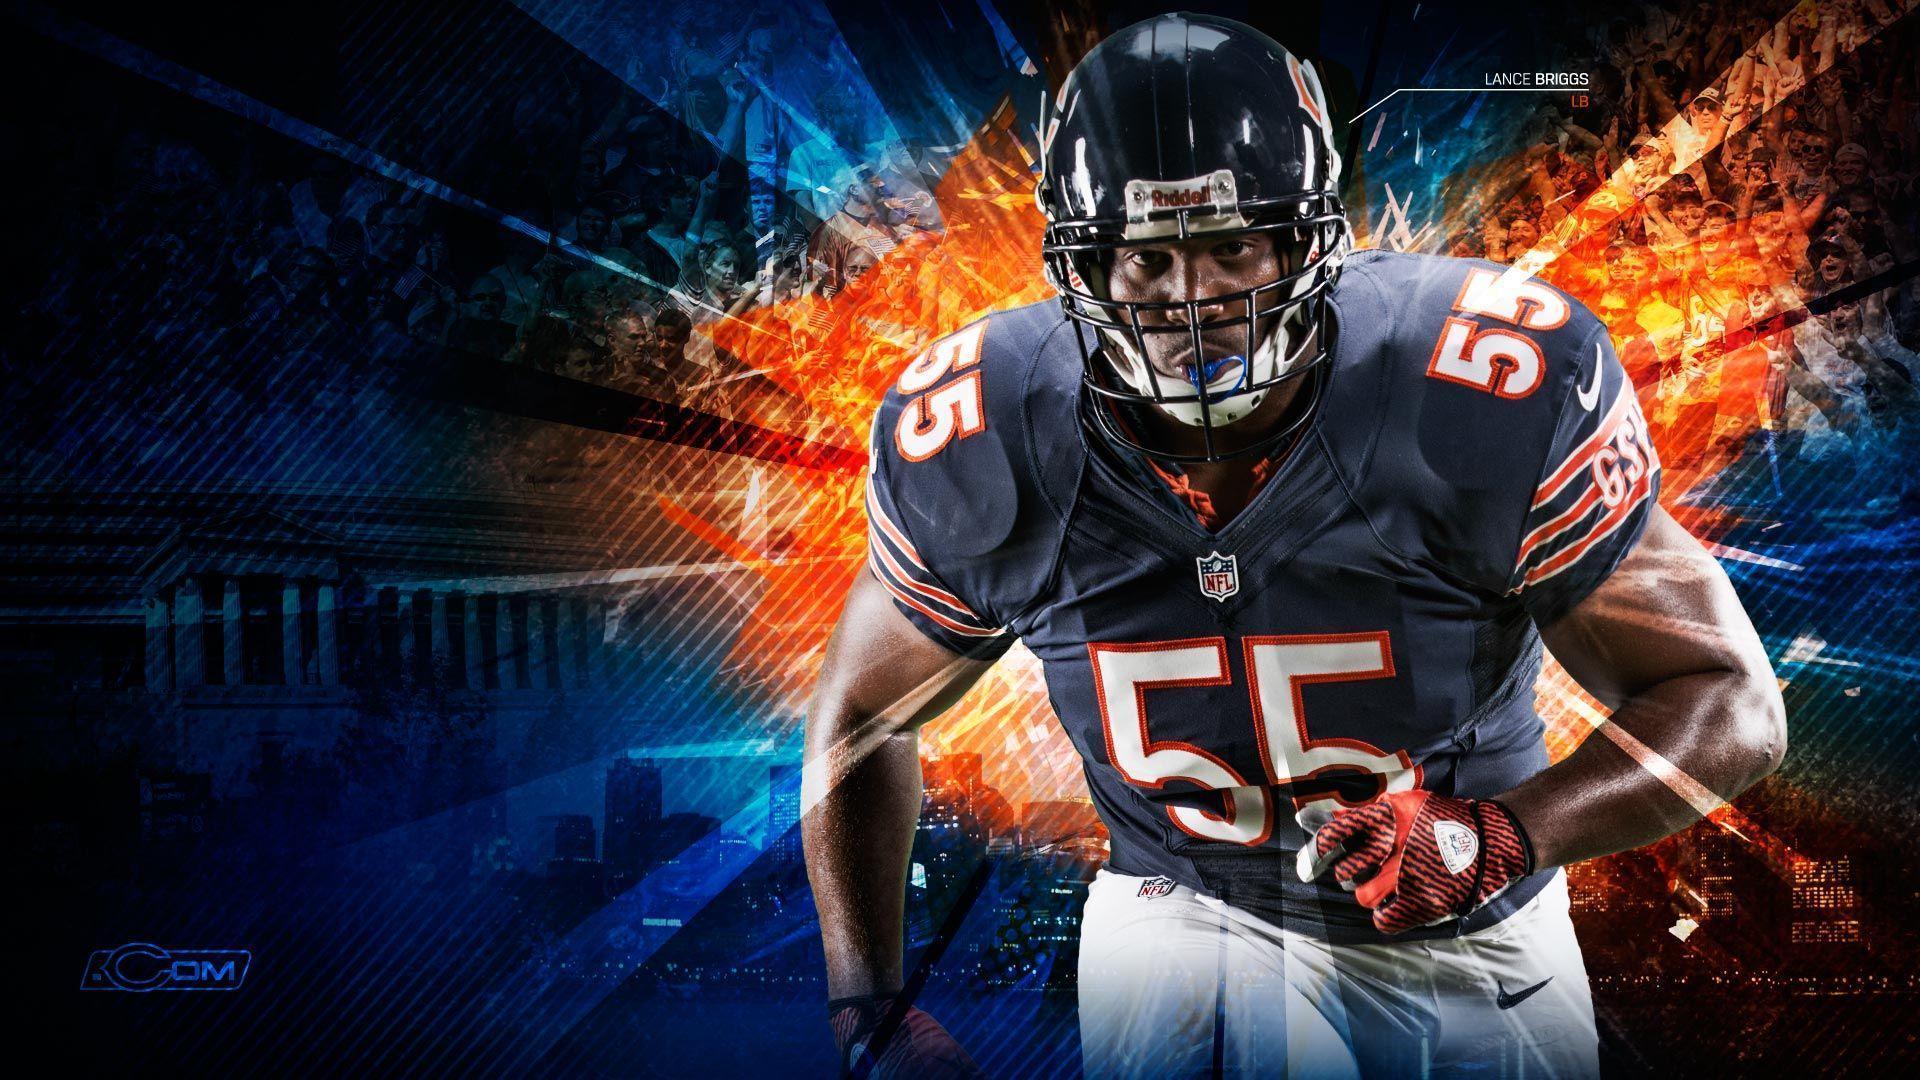 NFL Wallpaper High Quality | I HD Images